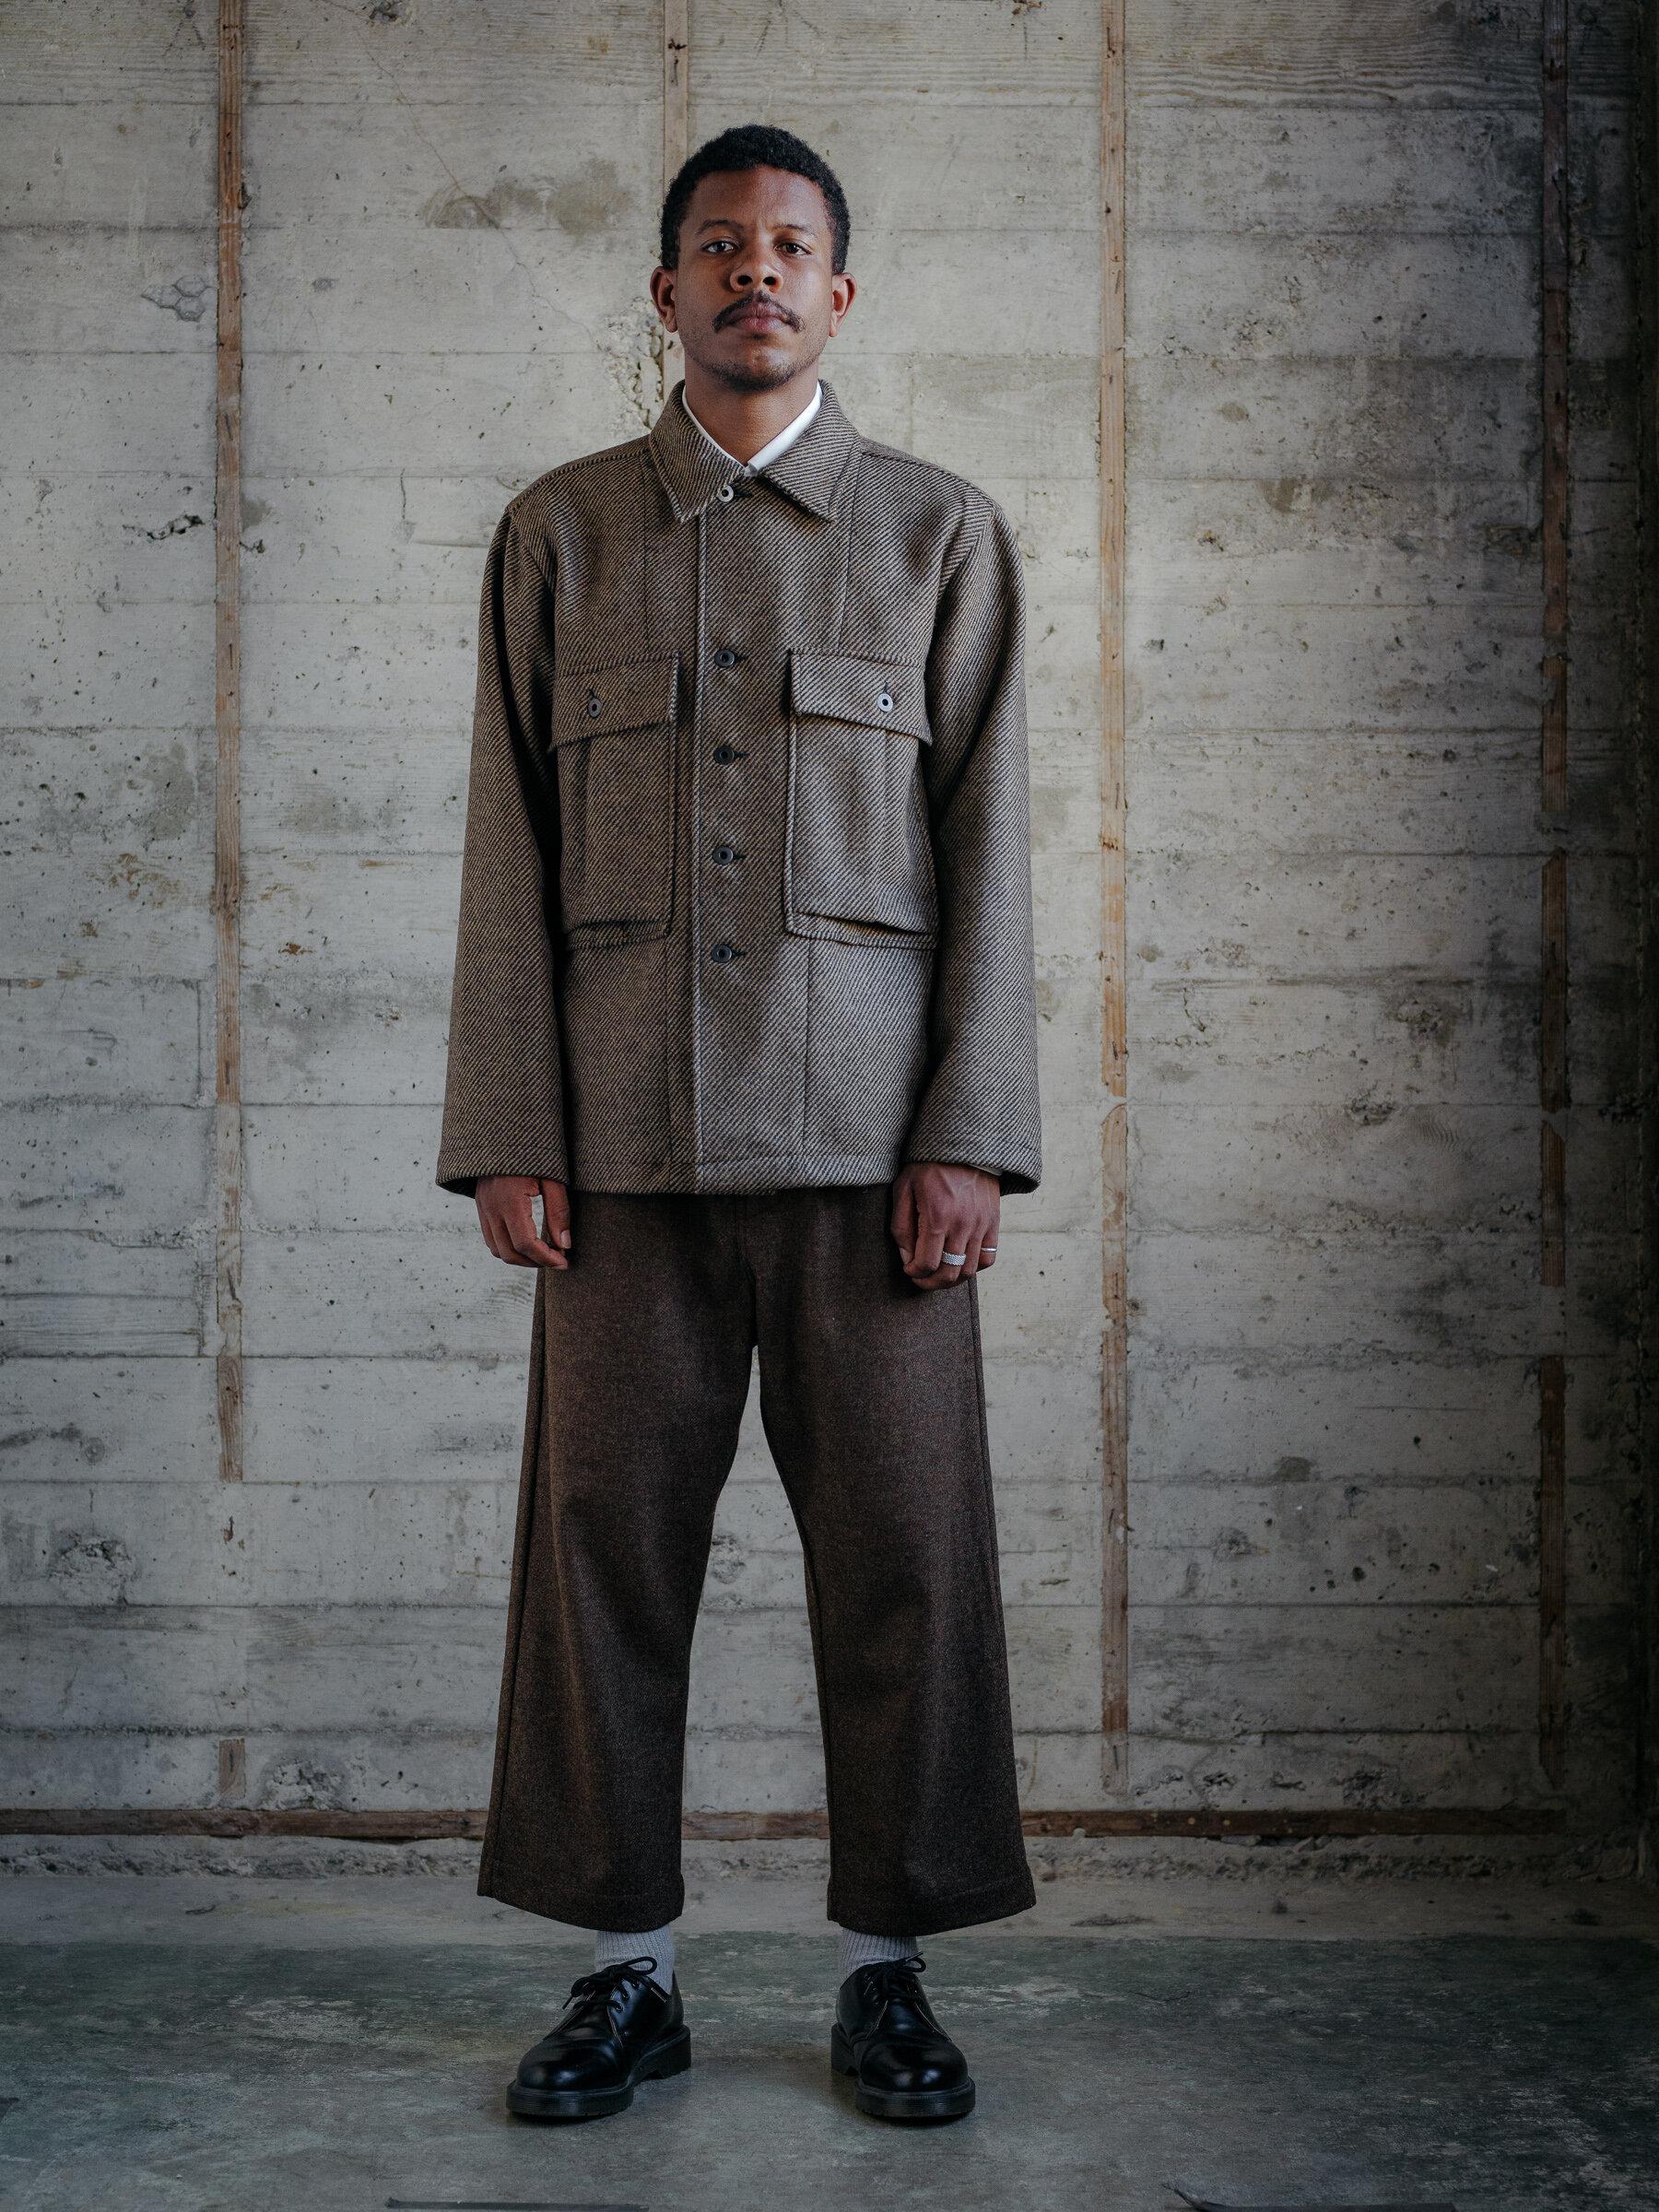 evan-kinori-bellow-pocket-jacket-lambswool-twill-woven-in-ireland-1